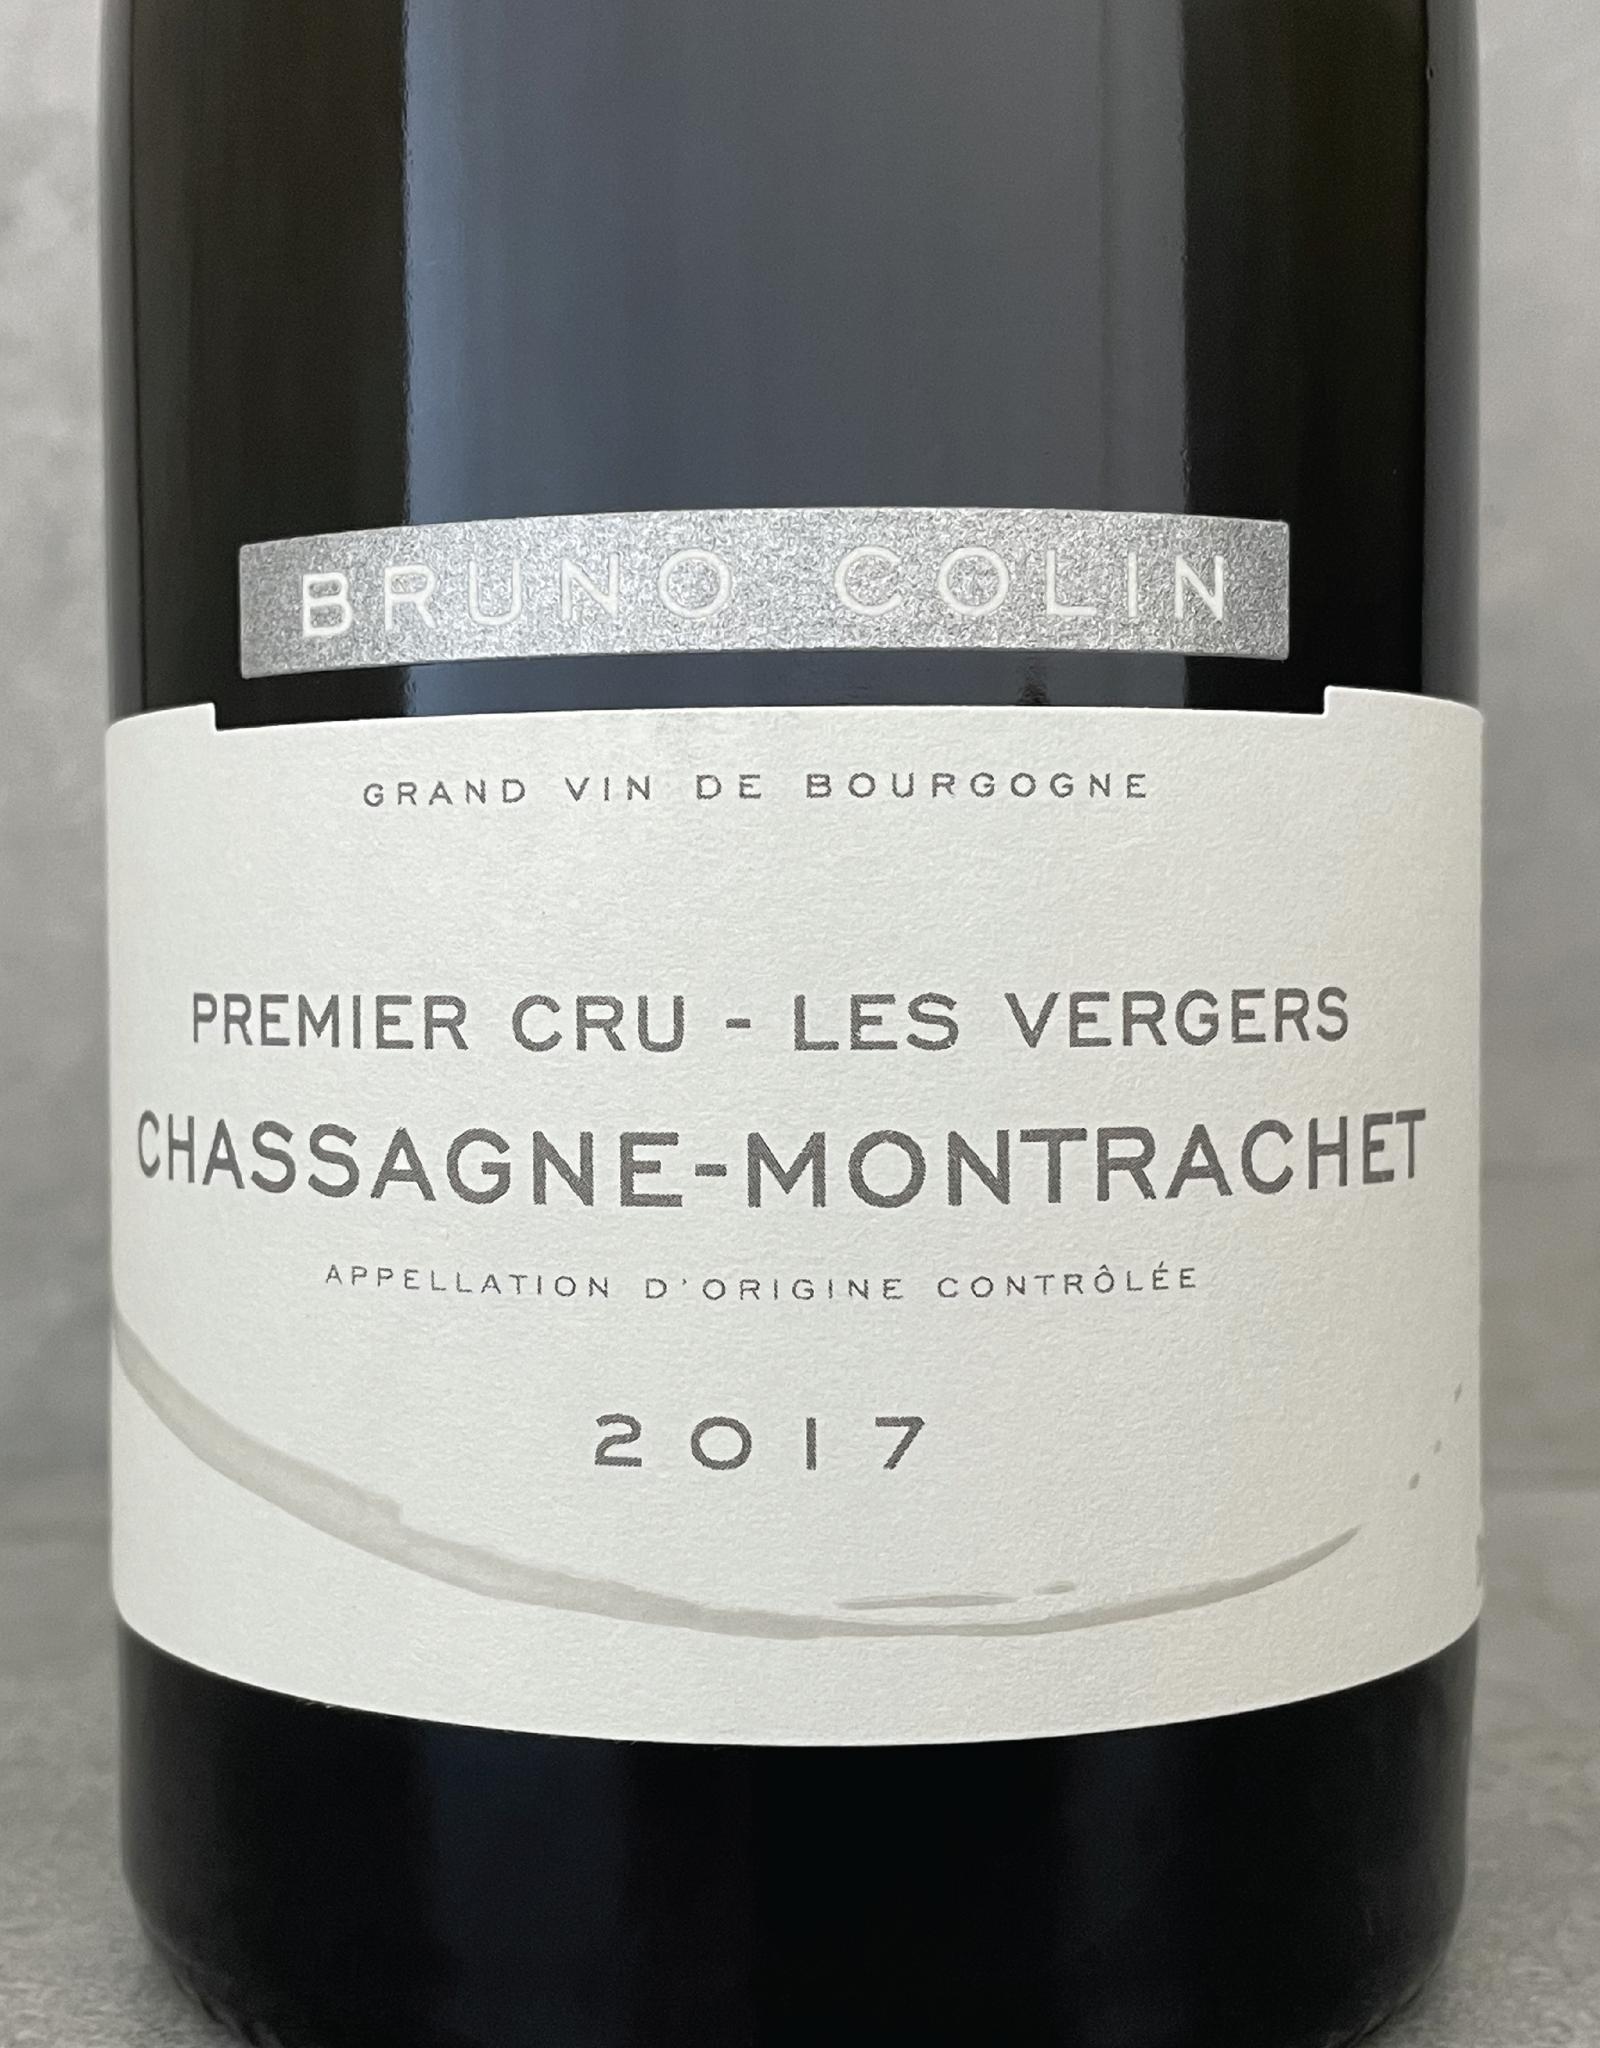 Bruno Colin Chassagne Montrachet 1er Cru Les Vergers 2017